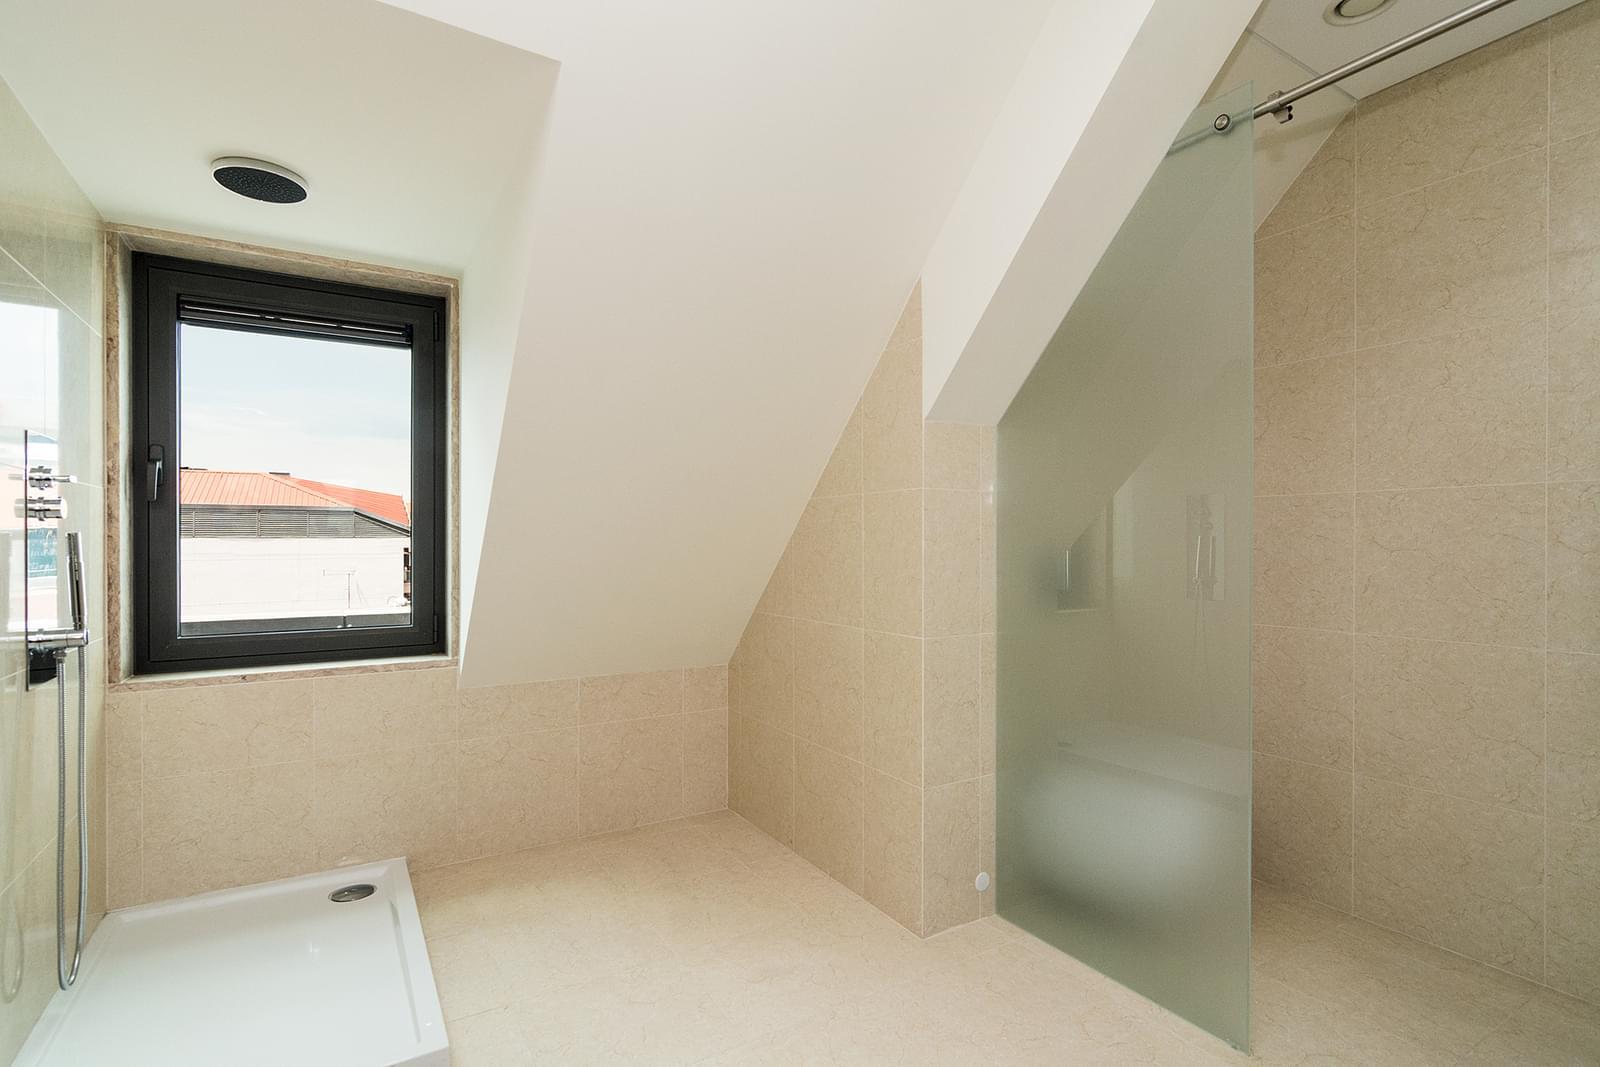 pf17442-apartamento-t3-lisboa-d3b6b74c-620d-47d6-ba6f-222fdaa905dc